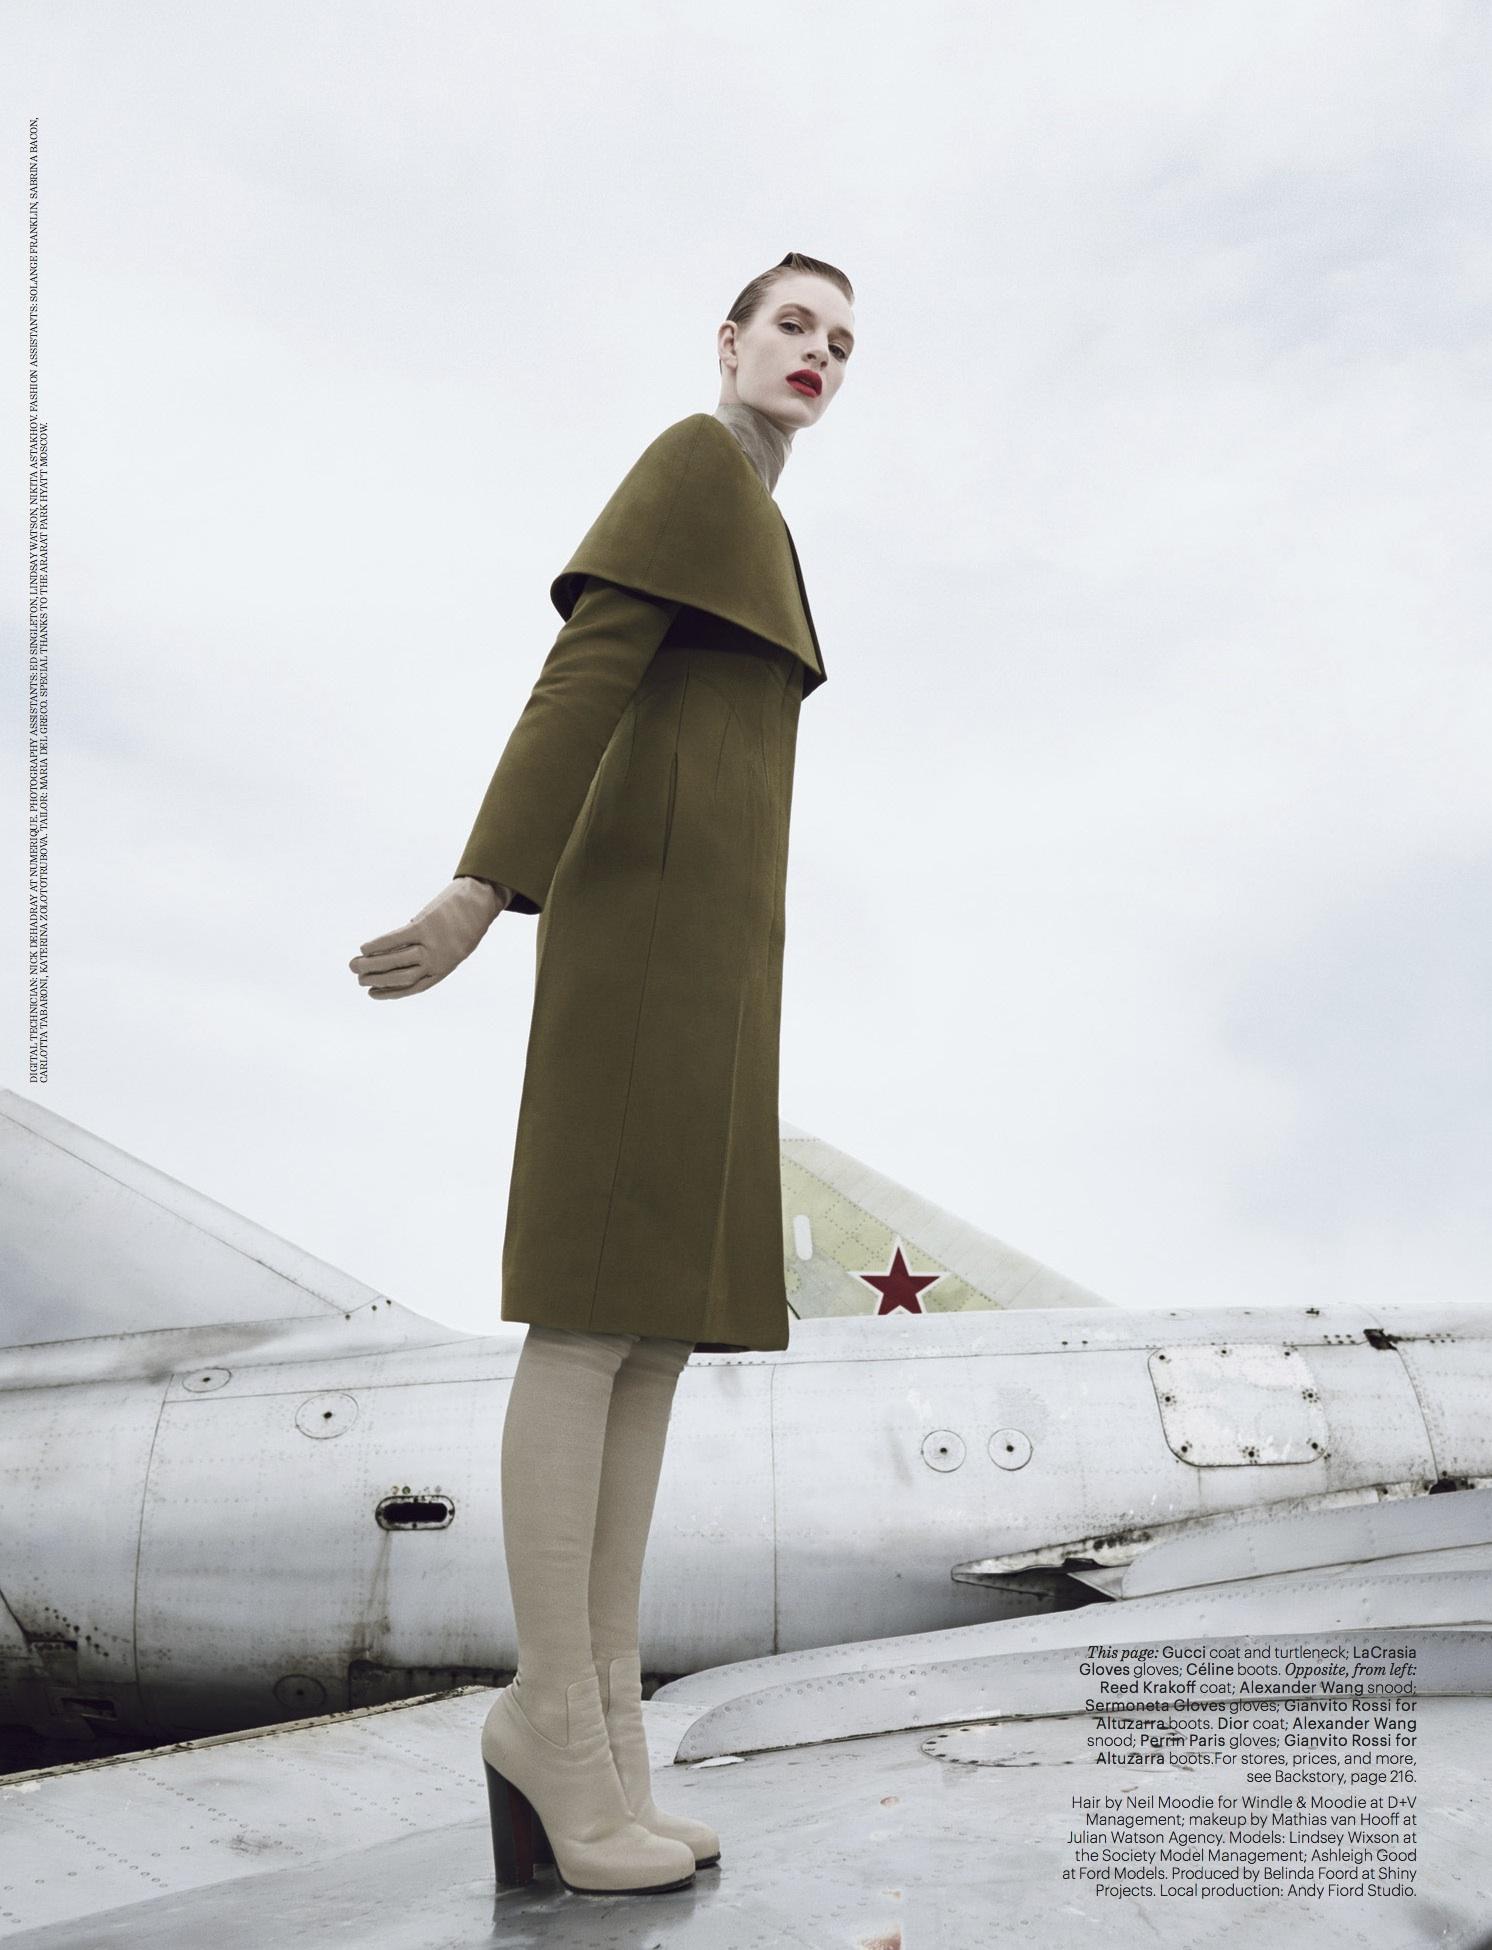 Giovanna-Battaglia-7-Super-Fly-W-Magazine-Emma-Summerton.jpg